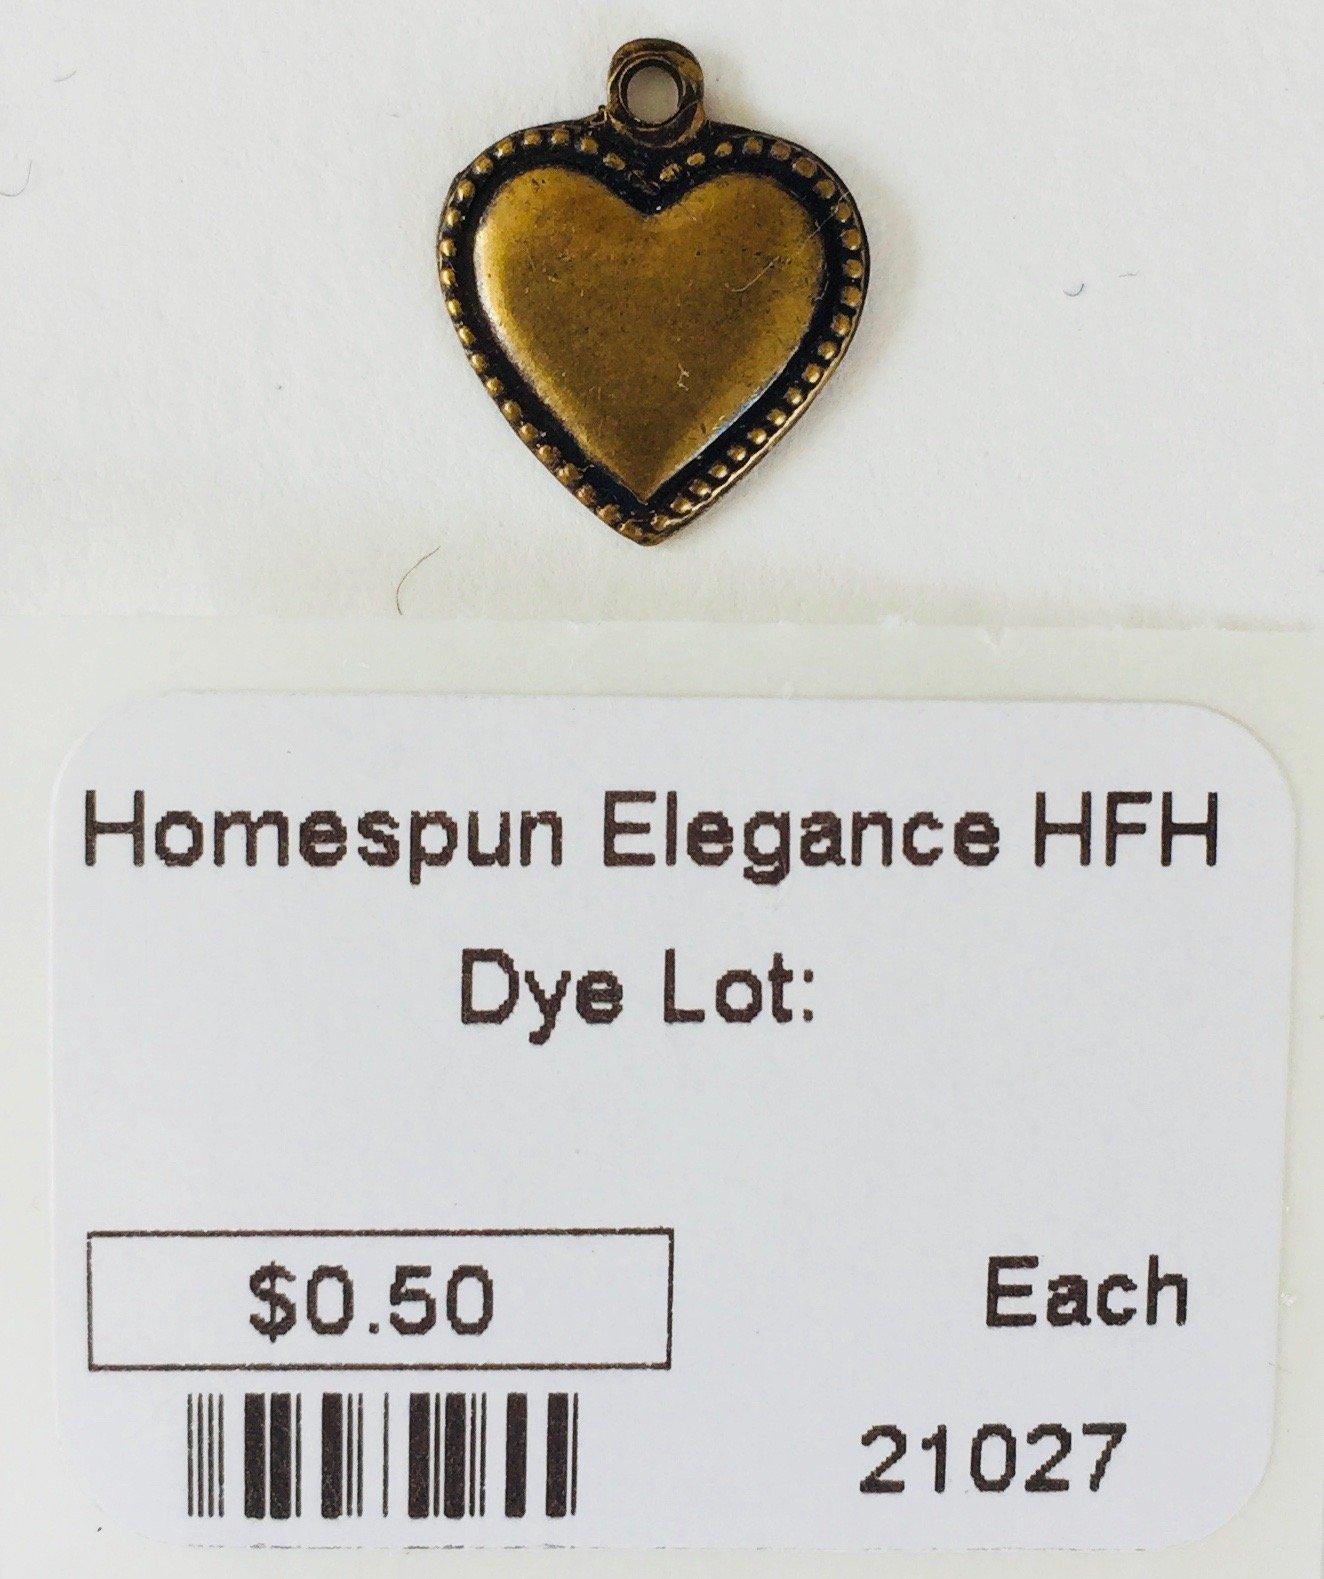 Homespun Elegance HFH